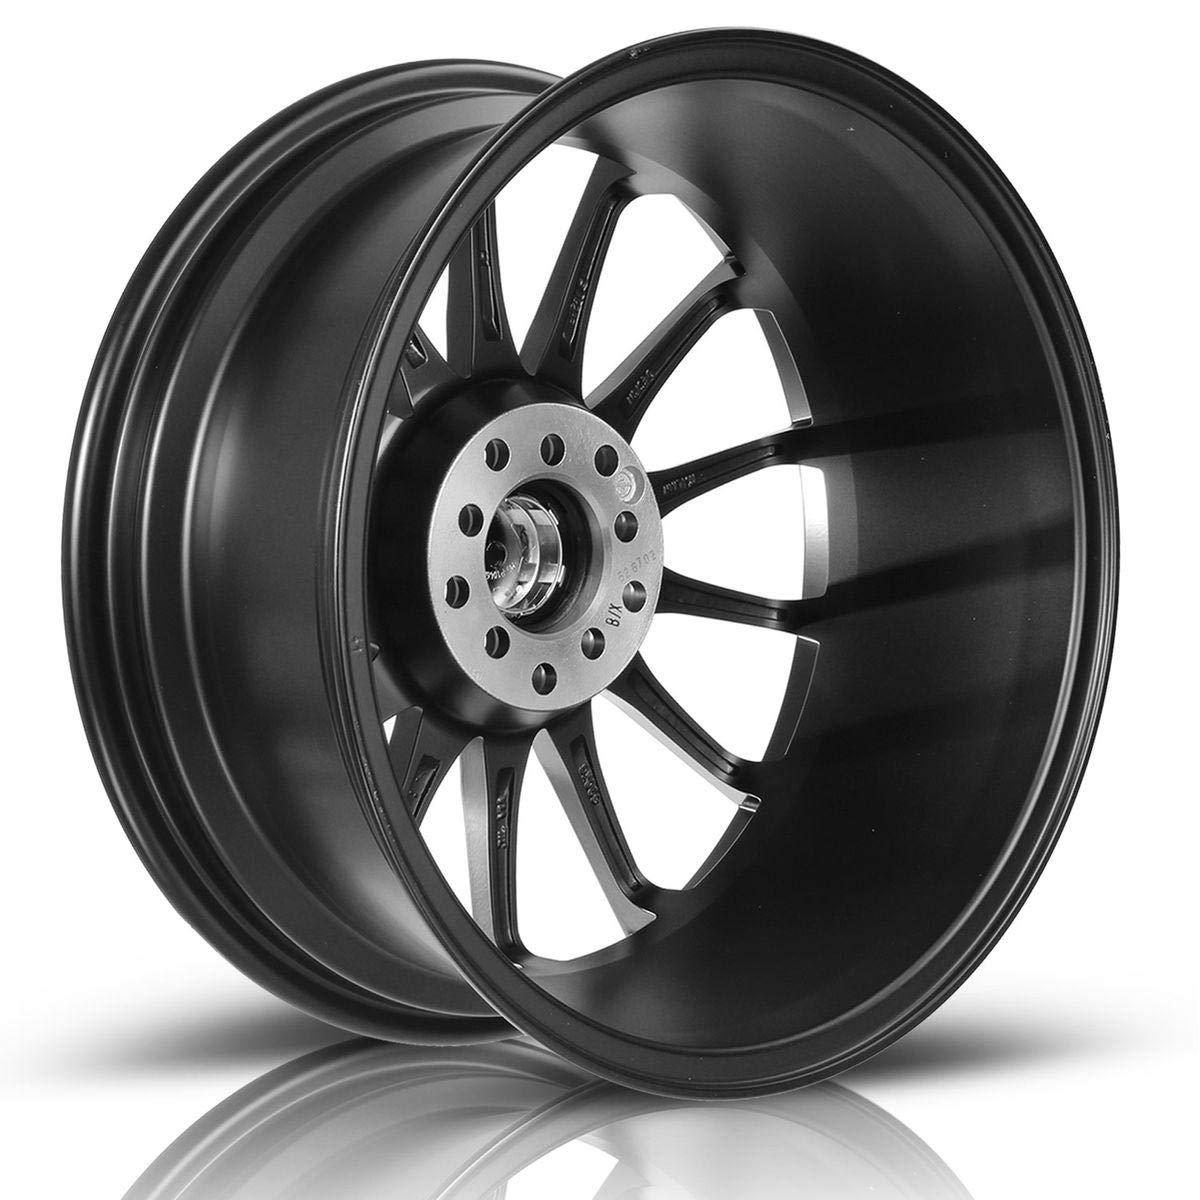 Wheels & Tires 73.1 MaxAuto 1 pcs 17x7 Matte Black Finish Rims ...